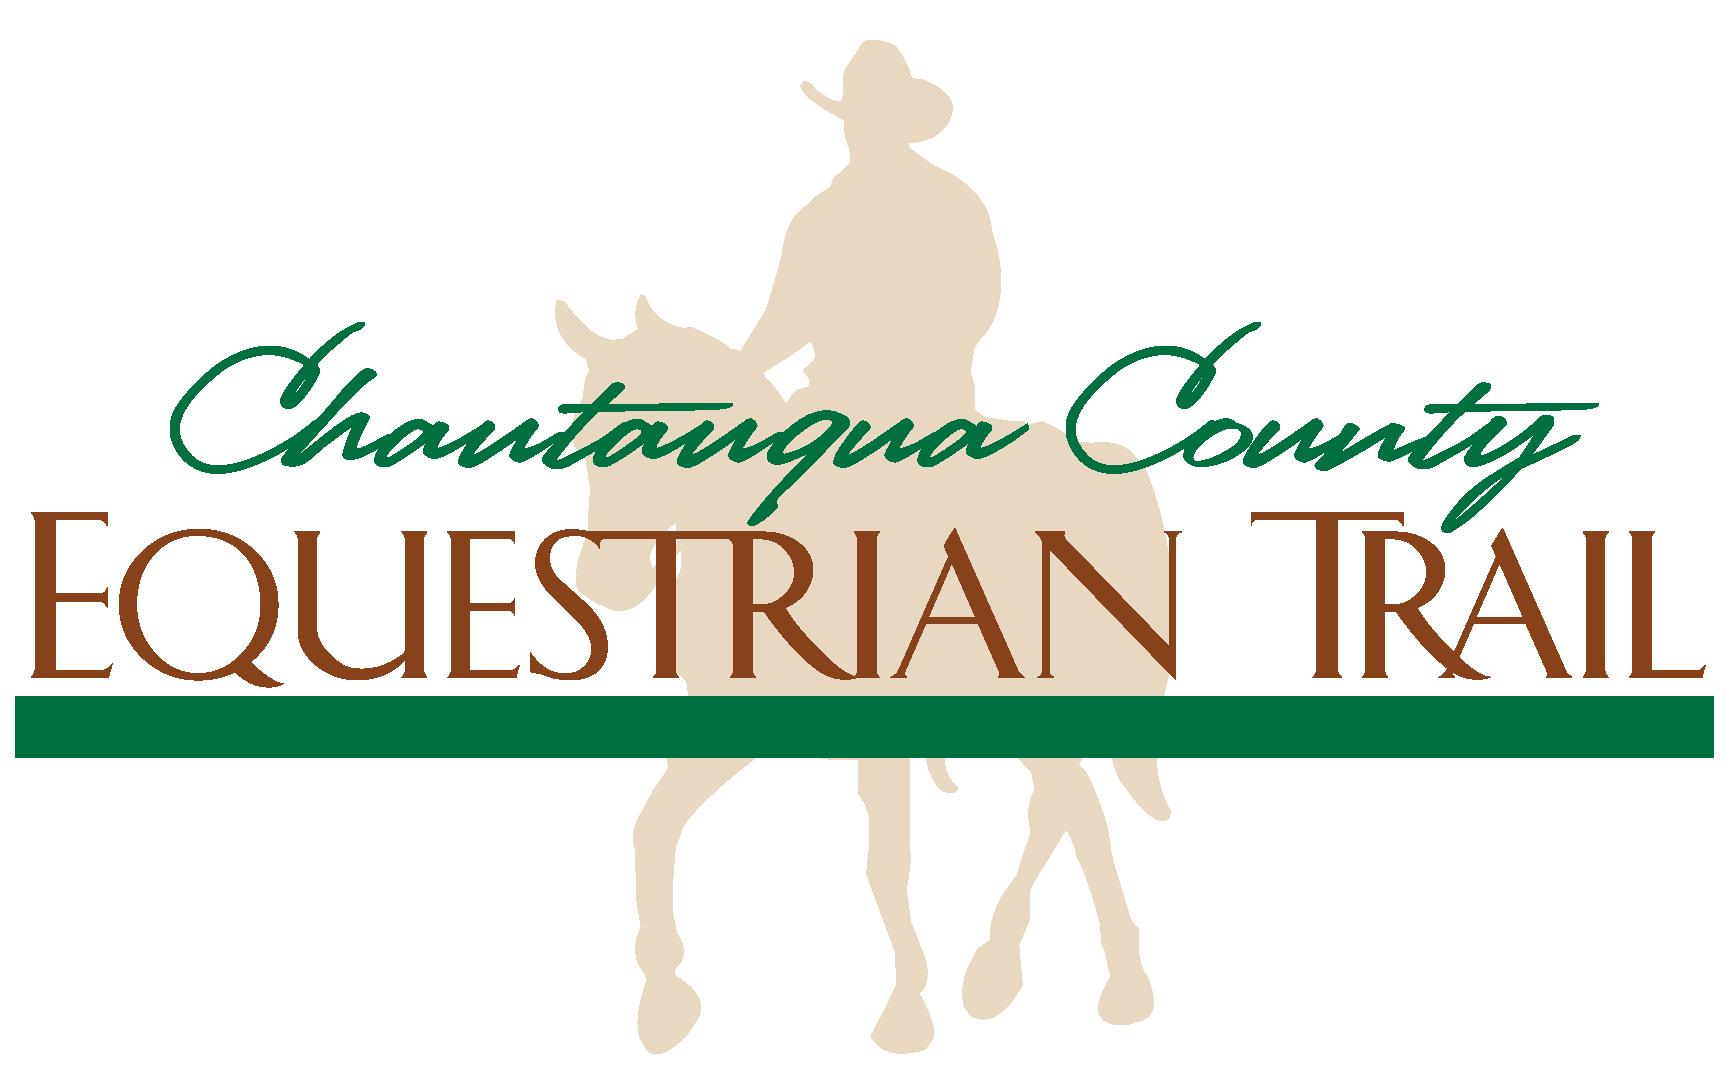 Chautauqua County Equestrian Trail System